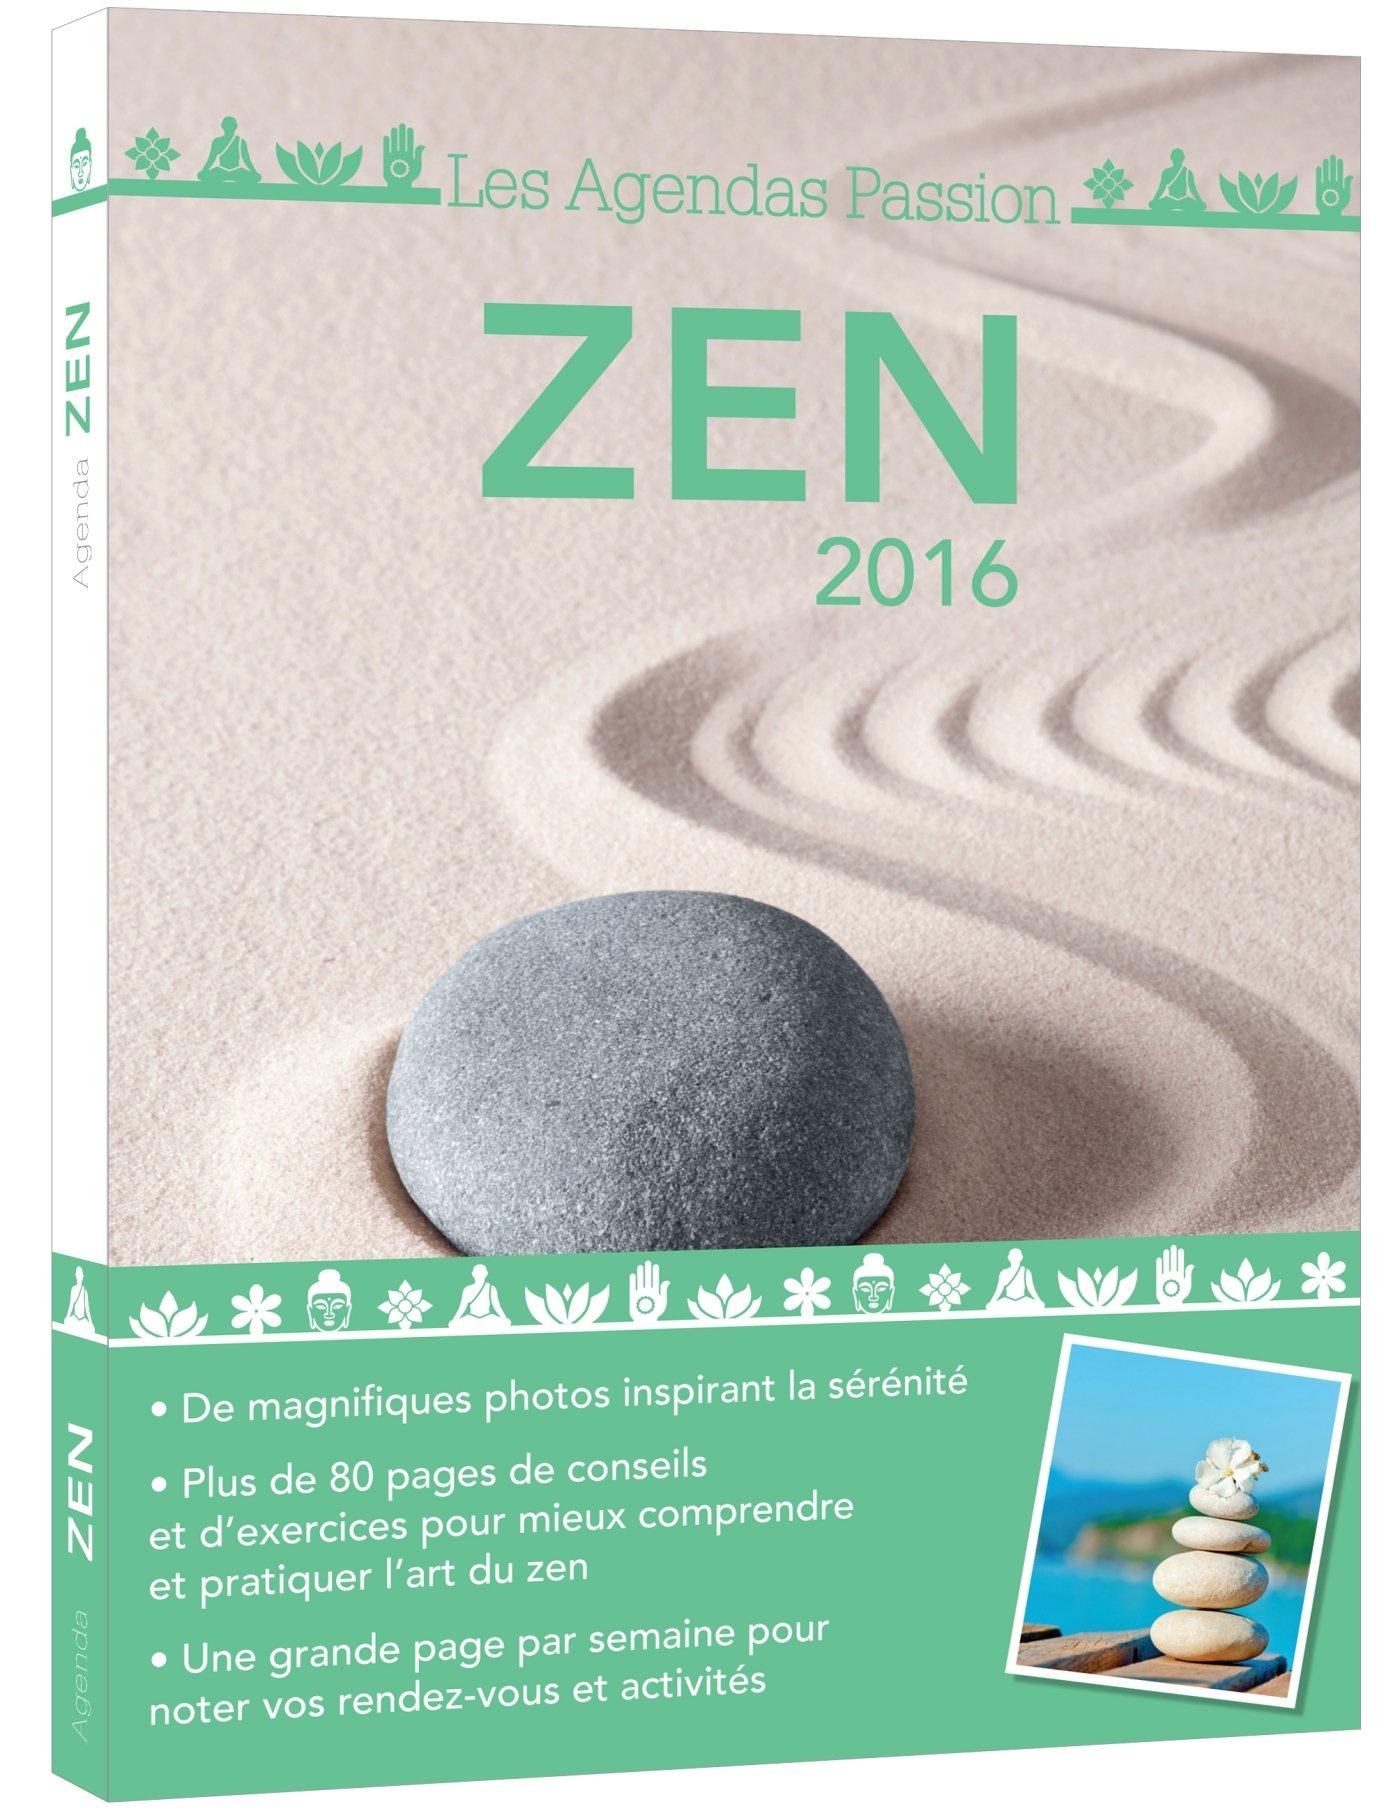 AGENDA PASSION ZEN 2016 (ED.365 AGE.PASS): Amazon.es: Erik ...